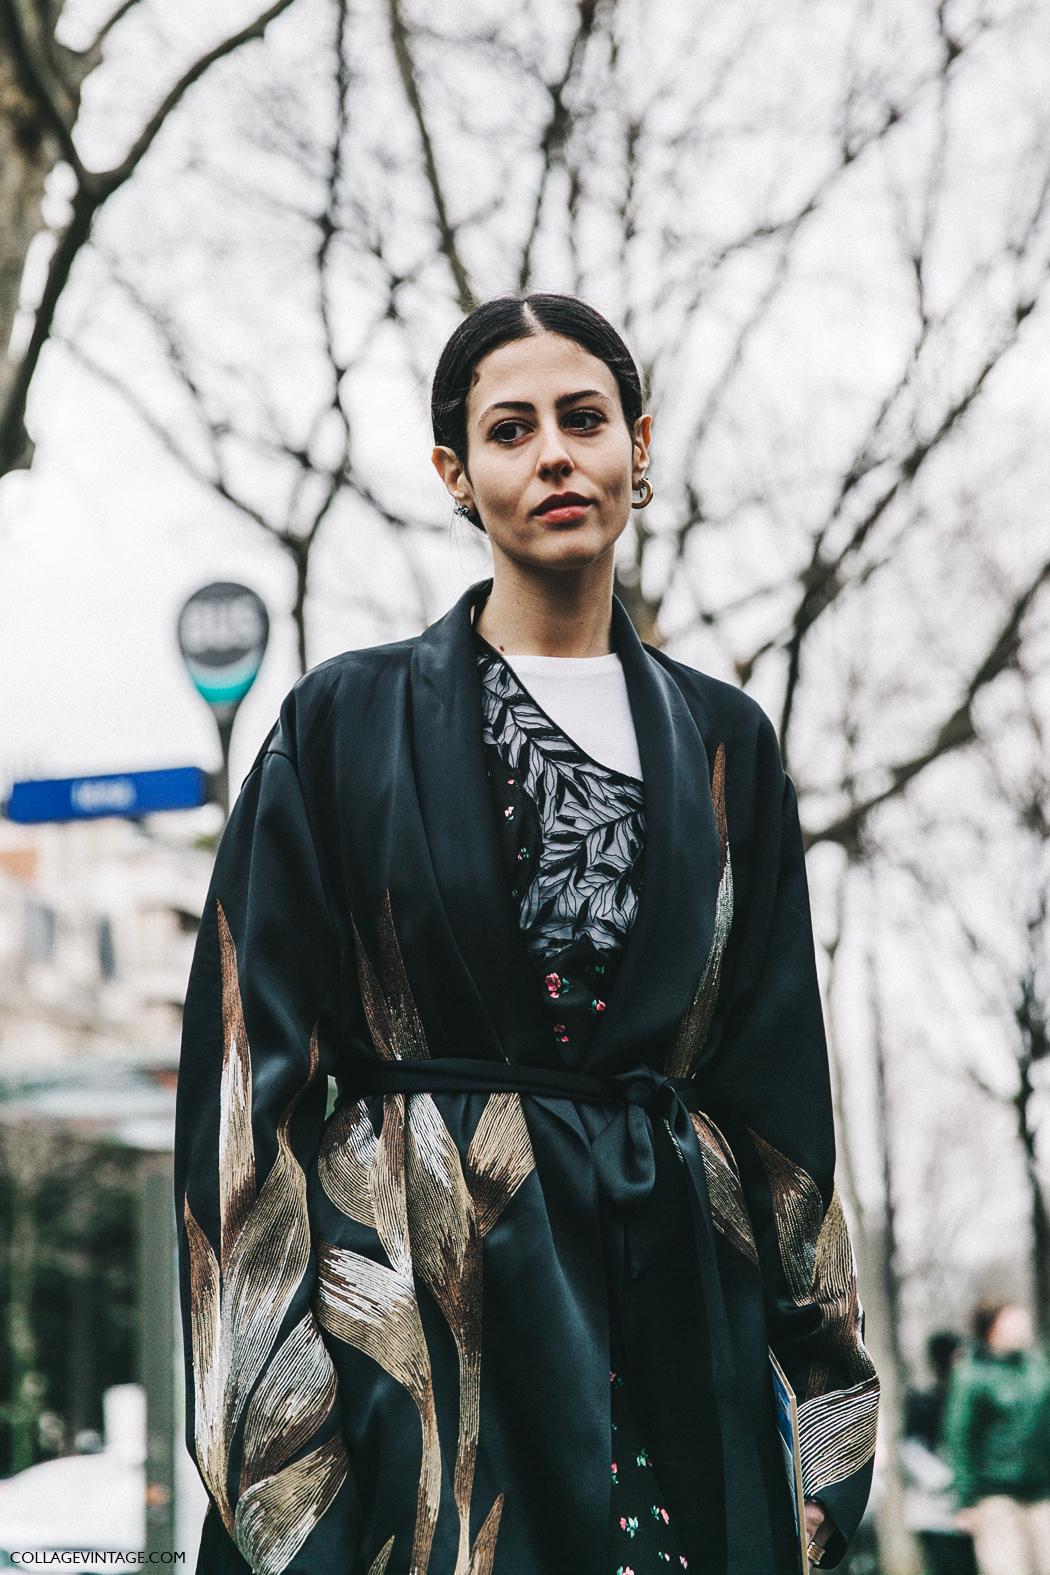 PFW-Paris_Fashion_Week_Fall_2016-Street_Style-Collage_Vintage-Miu_Miu-Gilda_Ambrossio-